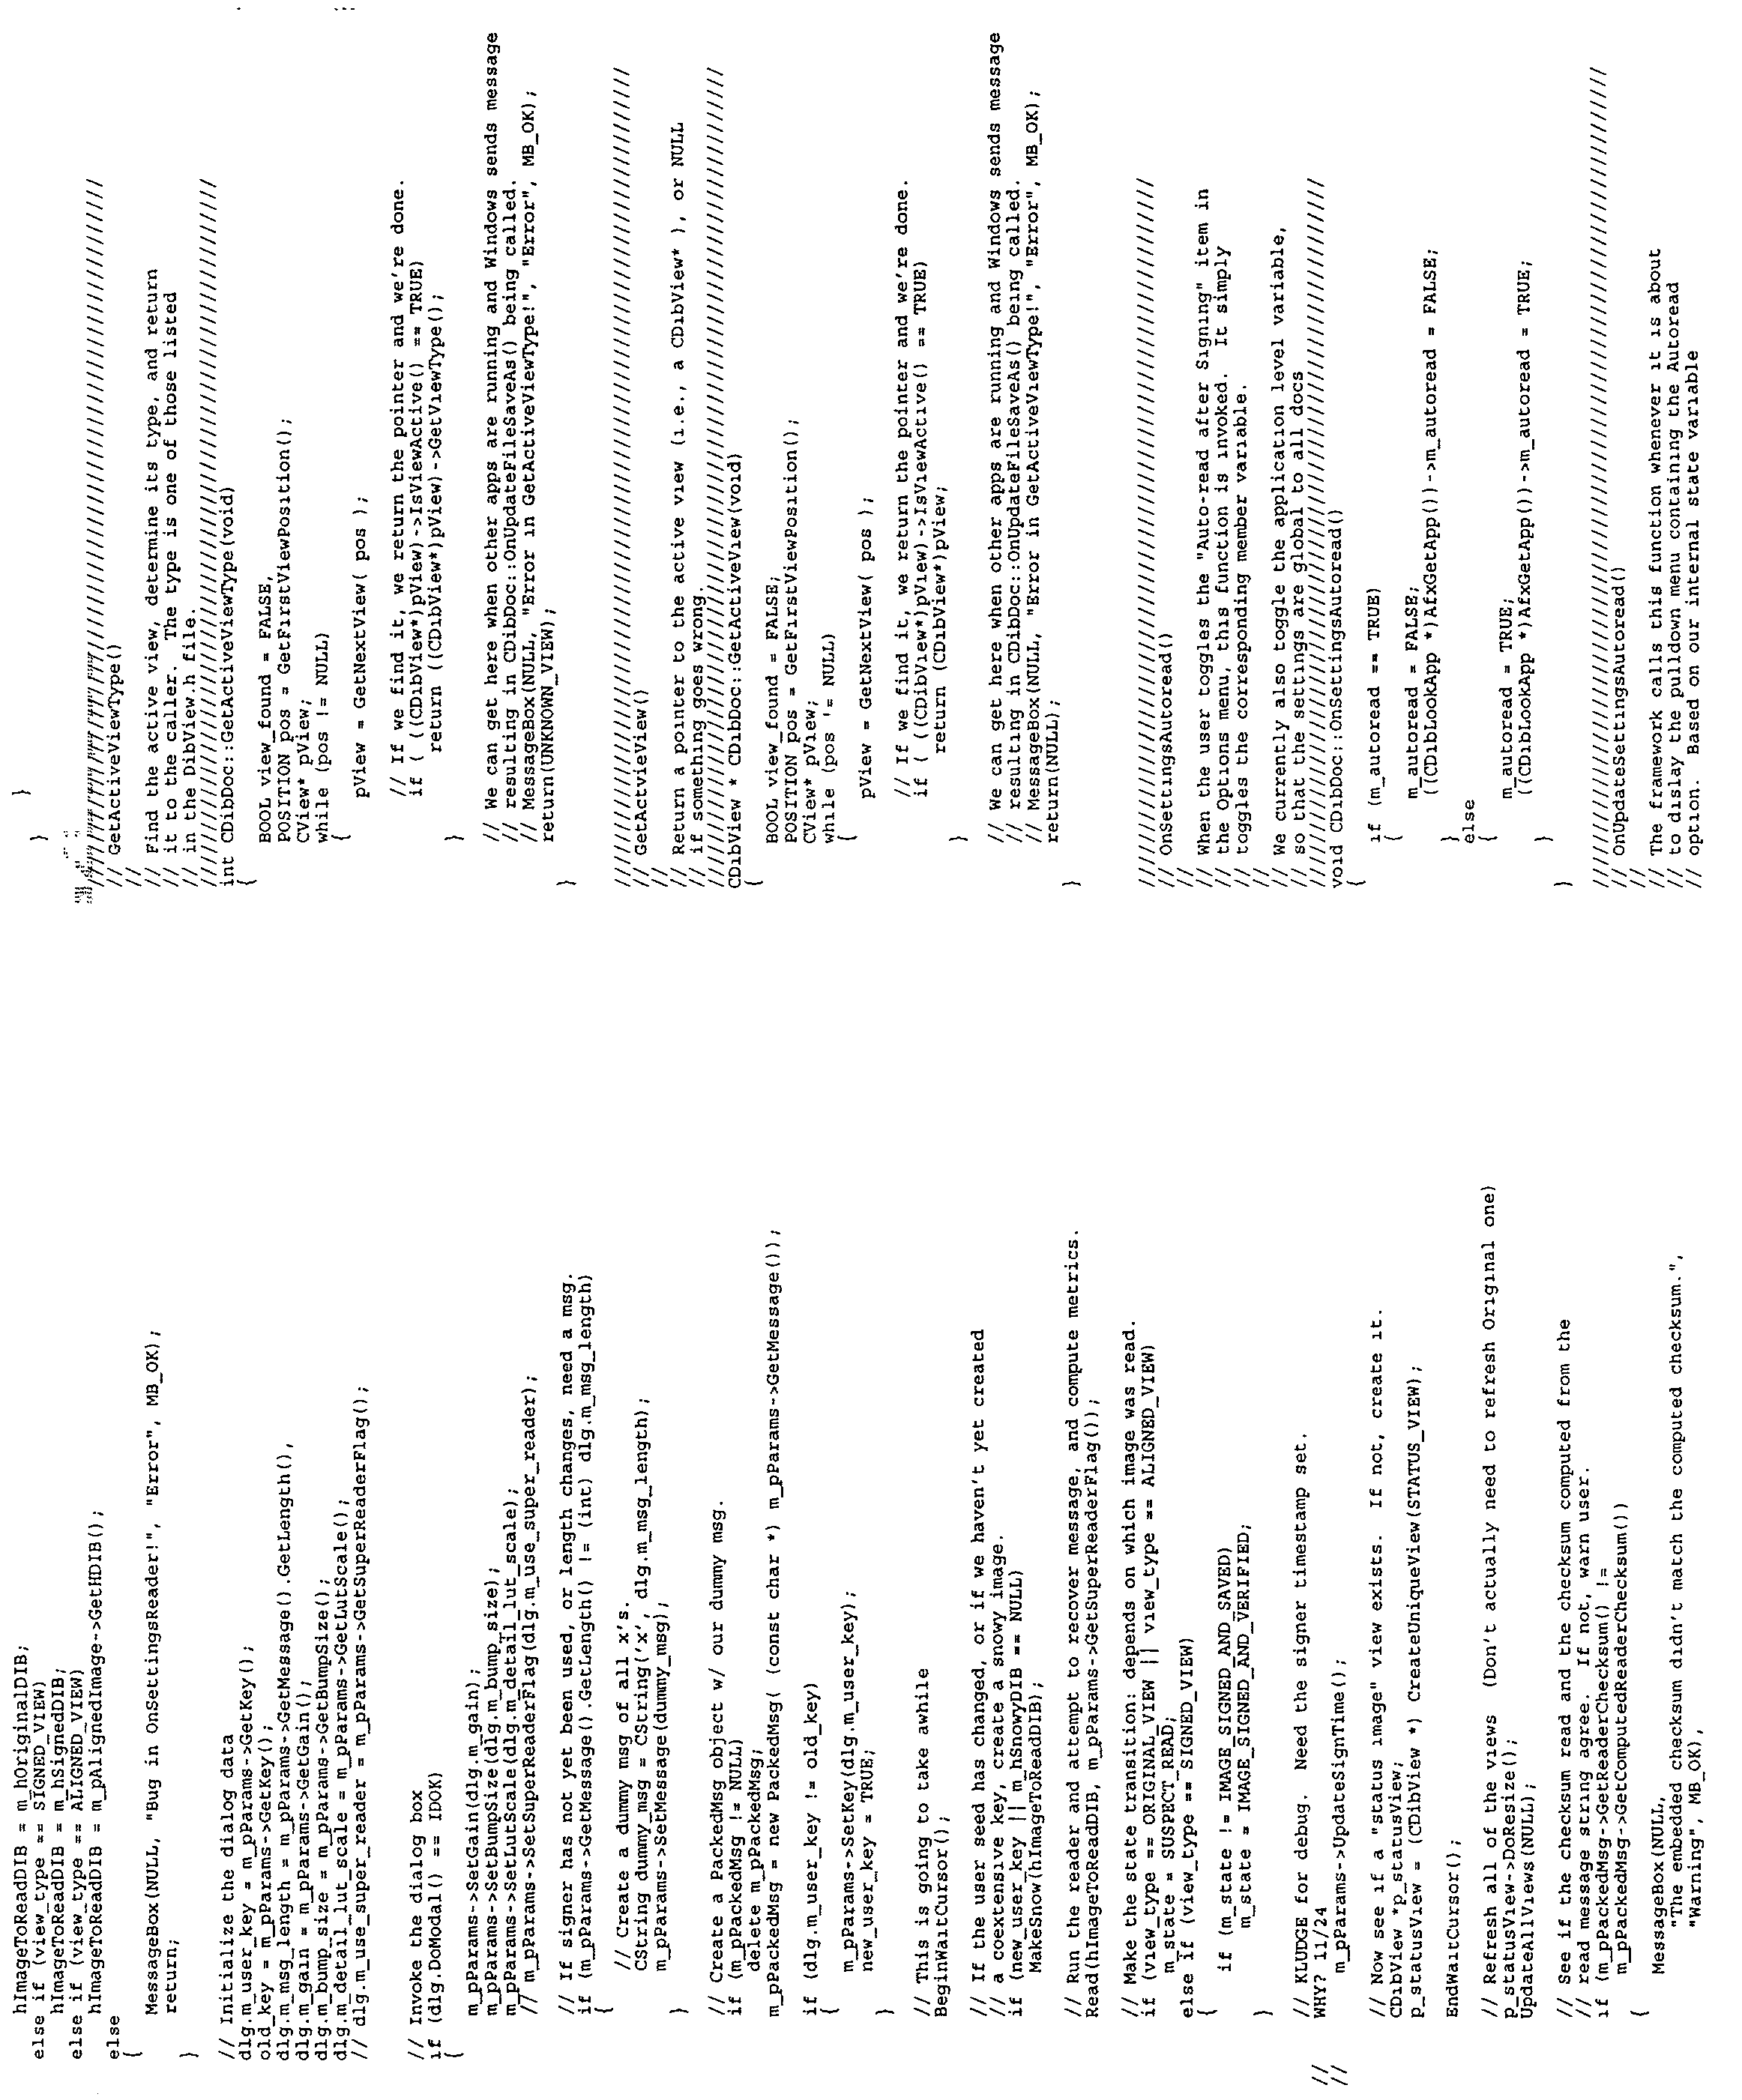 Figure US20020118831A1-20020829-P00131